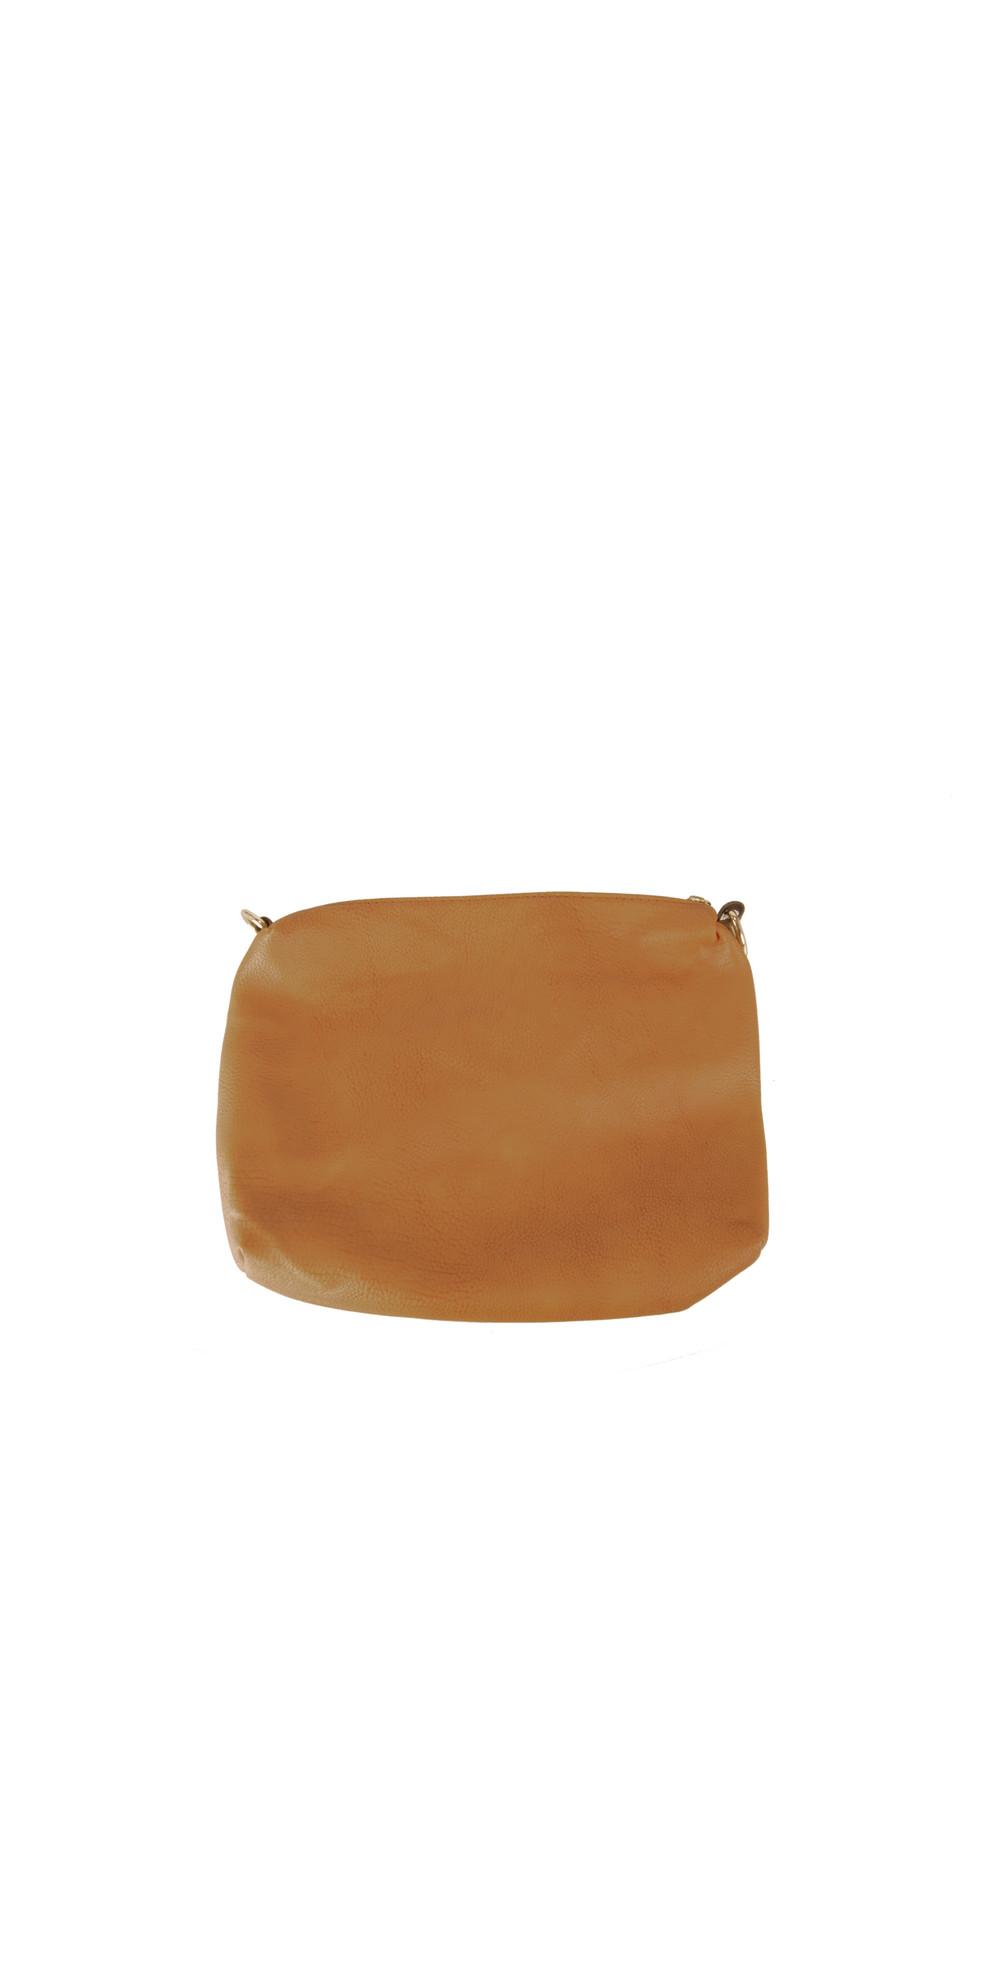 Coco Tote Bag with Mini Bag and Phone Purse main image